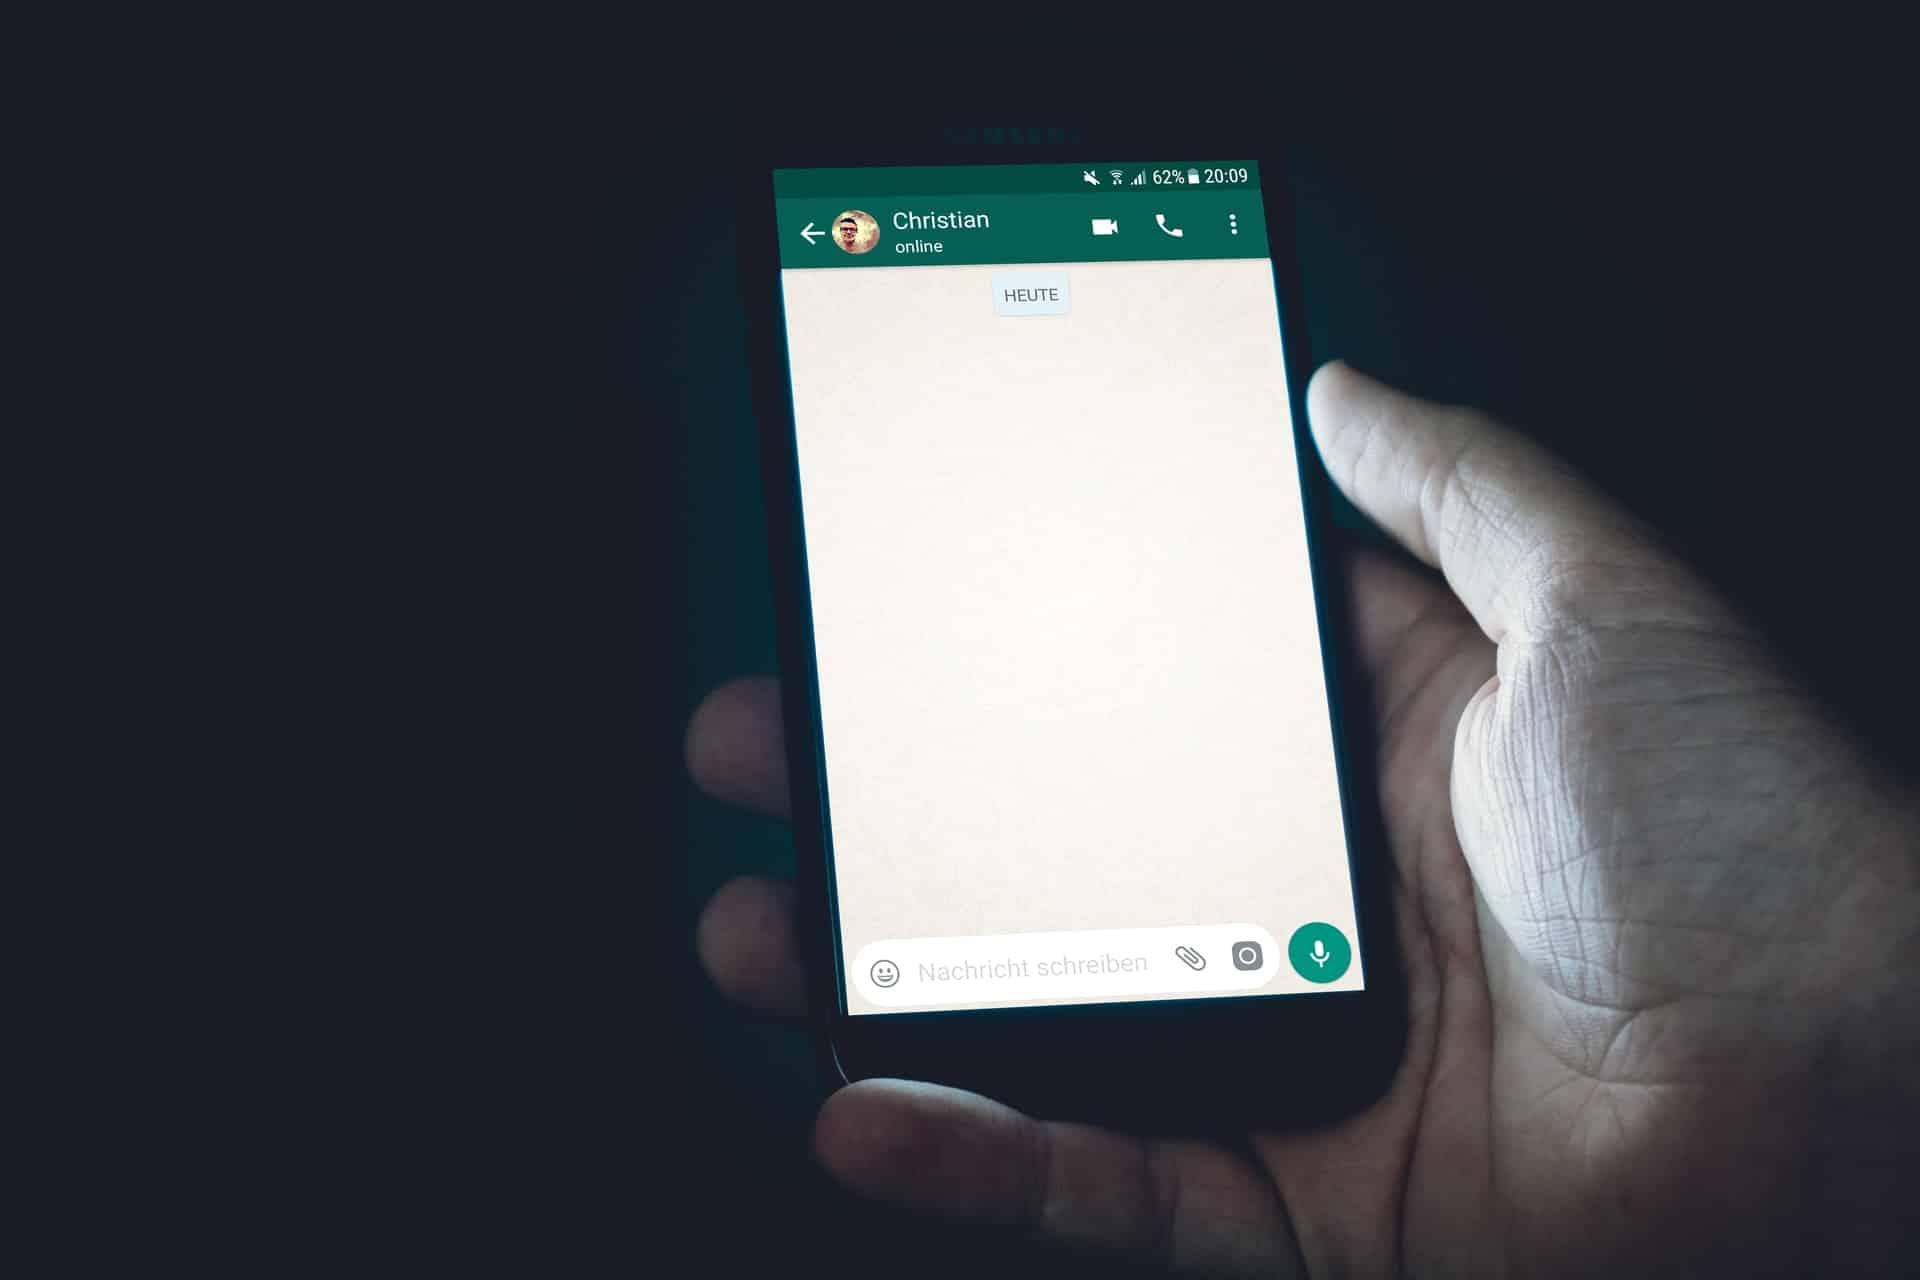 abordagem-venda-pelo-whatsapp